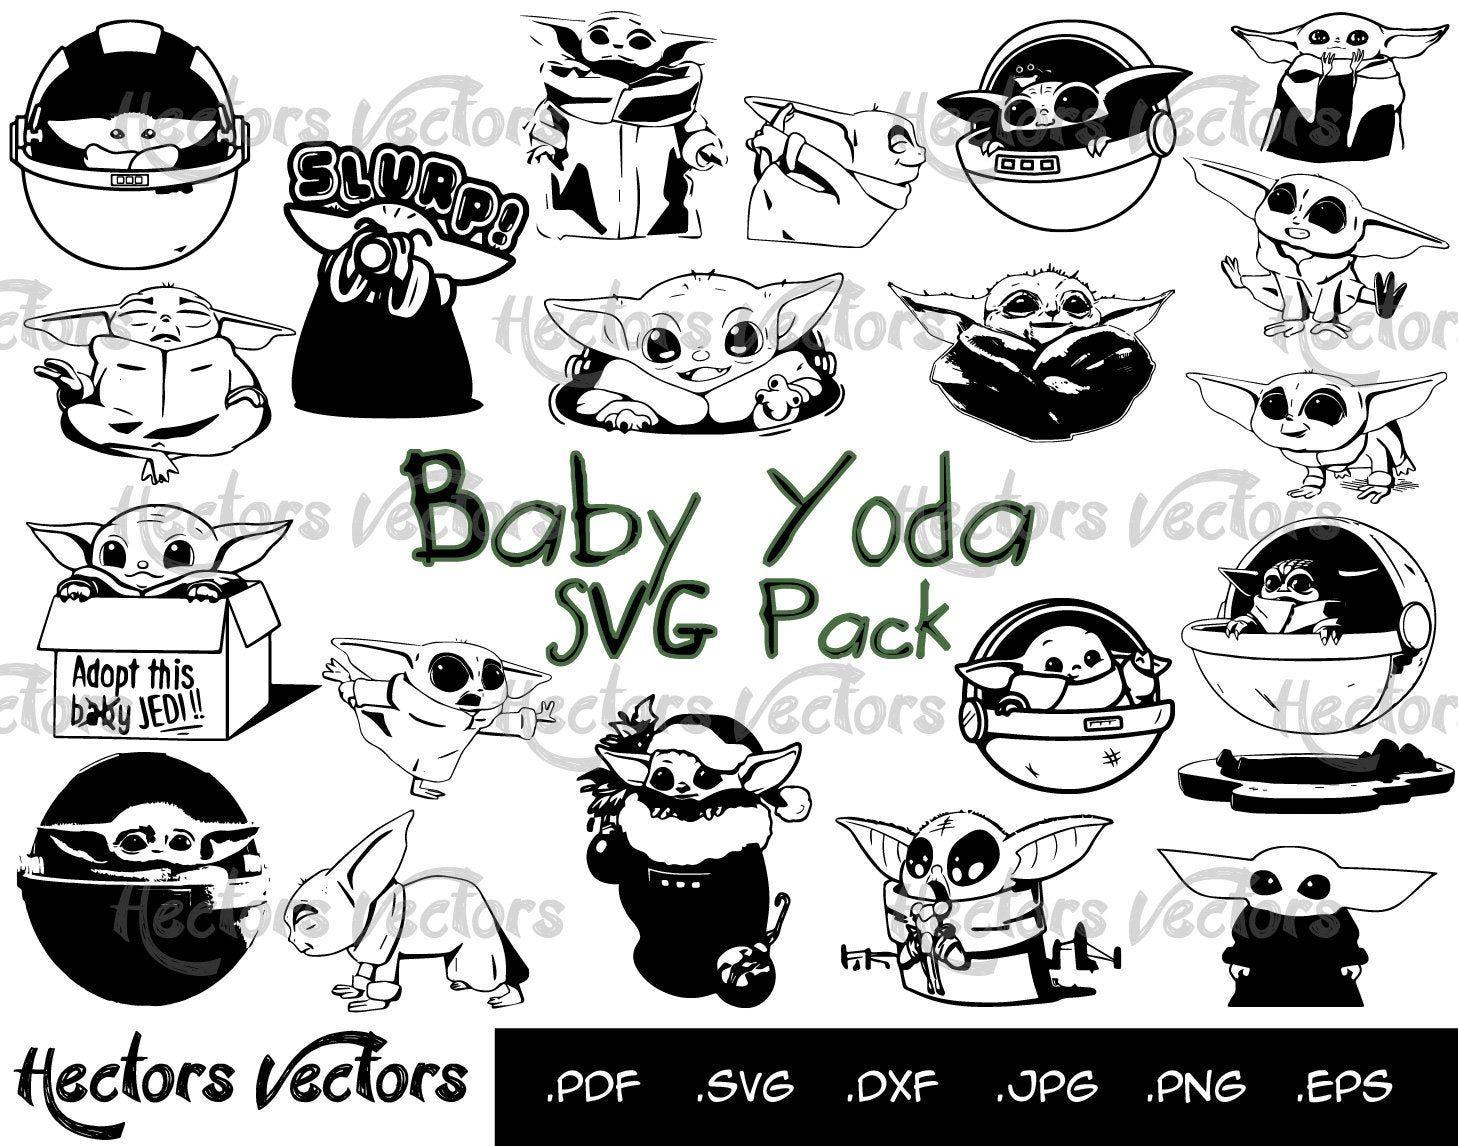 Baby Yoda SVG, Baby Yoda, Baby Yoda Vector, Baby Yoda